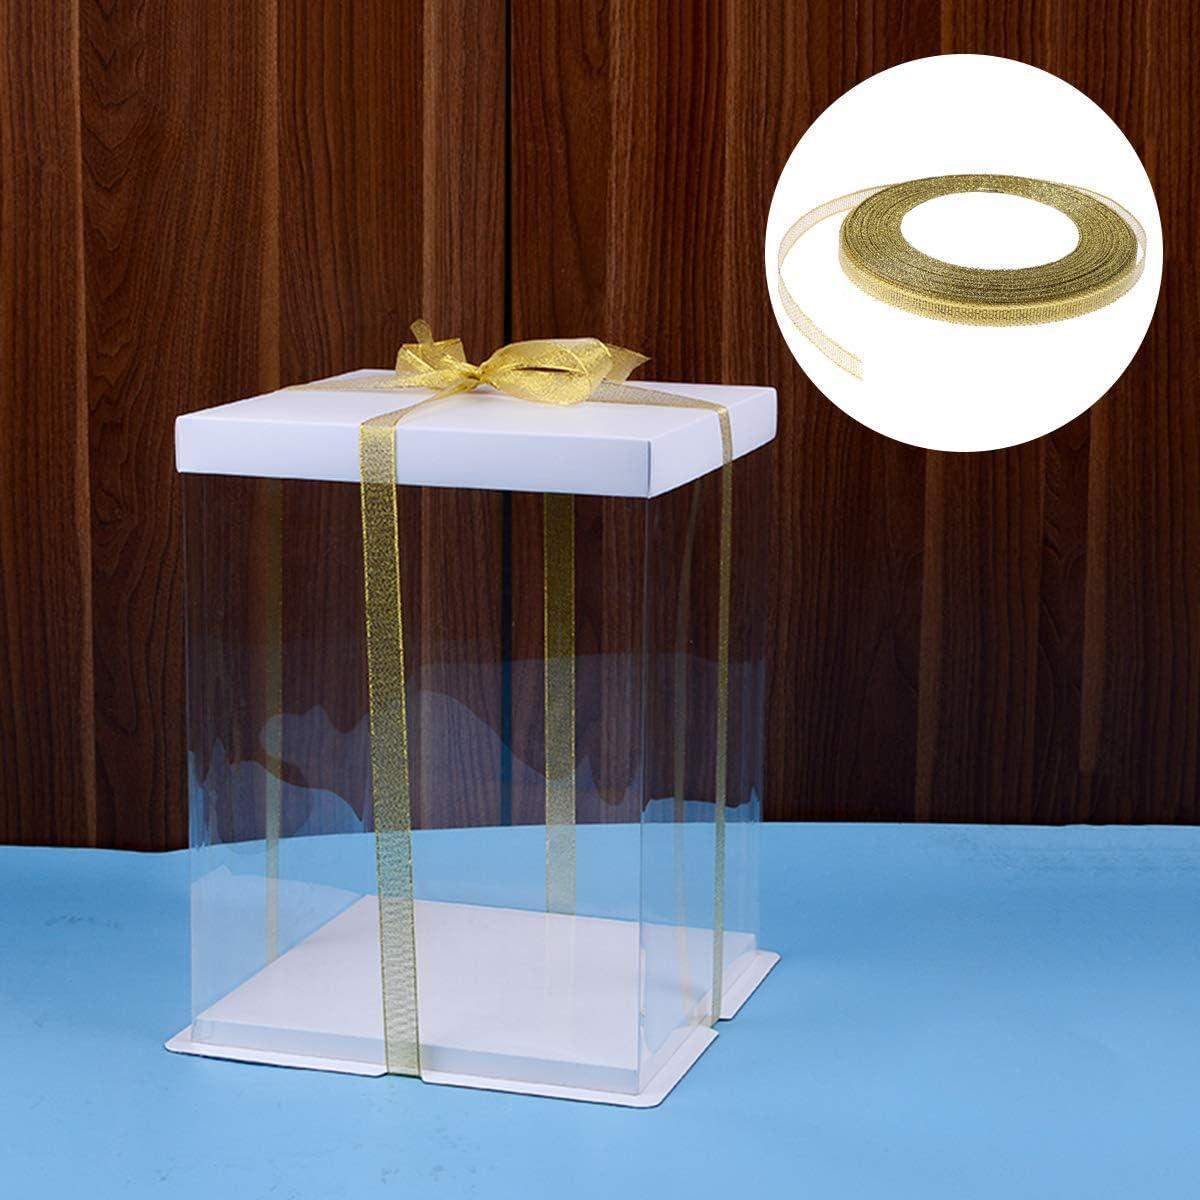 Supvox 5 ST/ÜCKE Geschenkband Seidenband Lockenband F/ür Geschenk Pr/äsentieren Ballon Handwerk 0,6 CM Golden